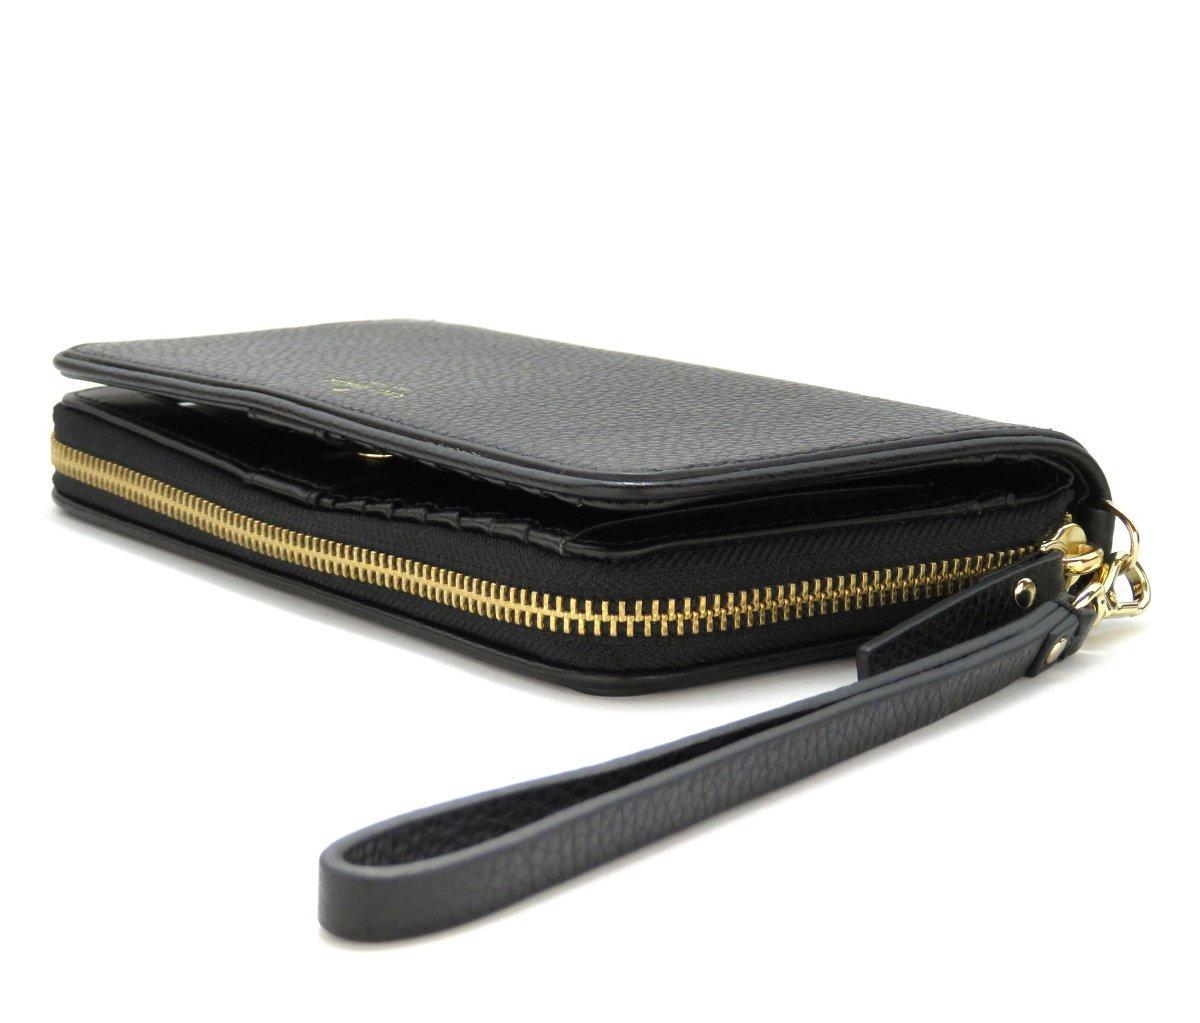 Kate Spade New York Mulberry Street Brigitta Wristlet Wallet Handbag (Black) by Kate Spade New York (Image #3)